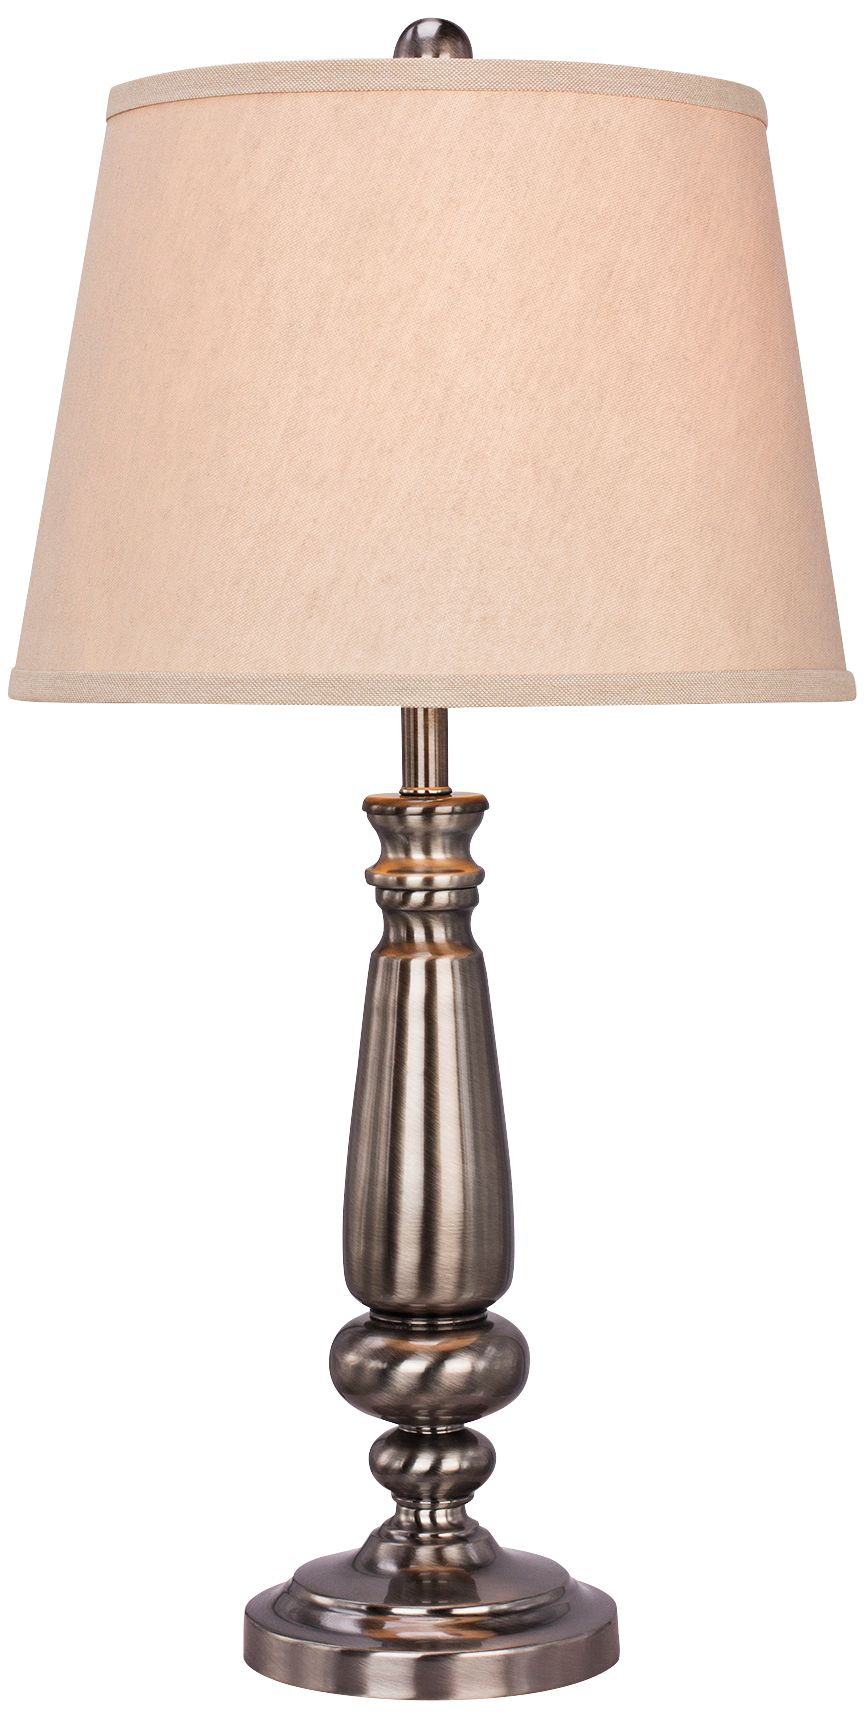 Louisburg Brushed Black Nickel Metal Table Lamp